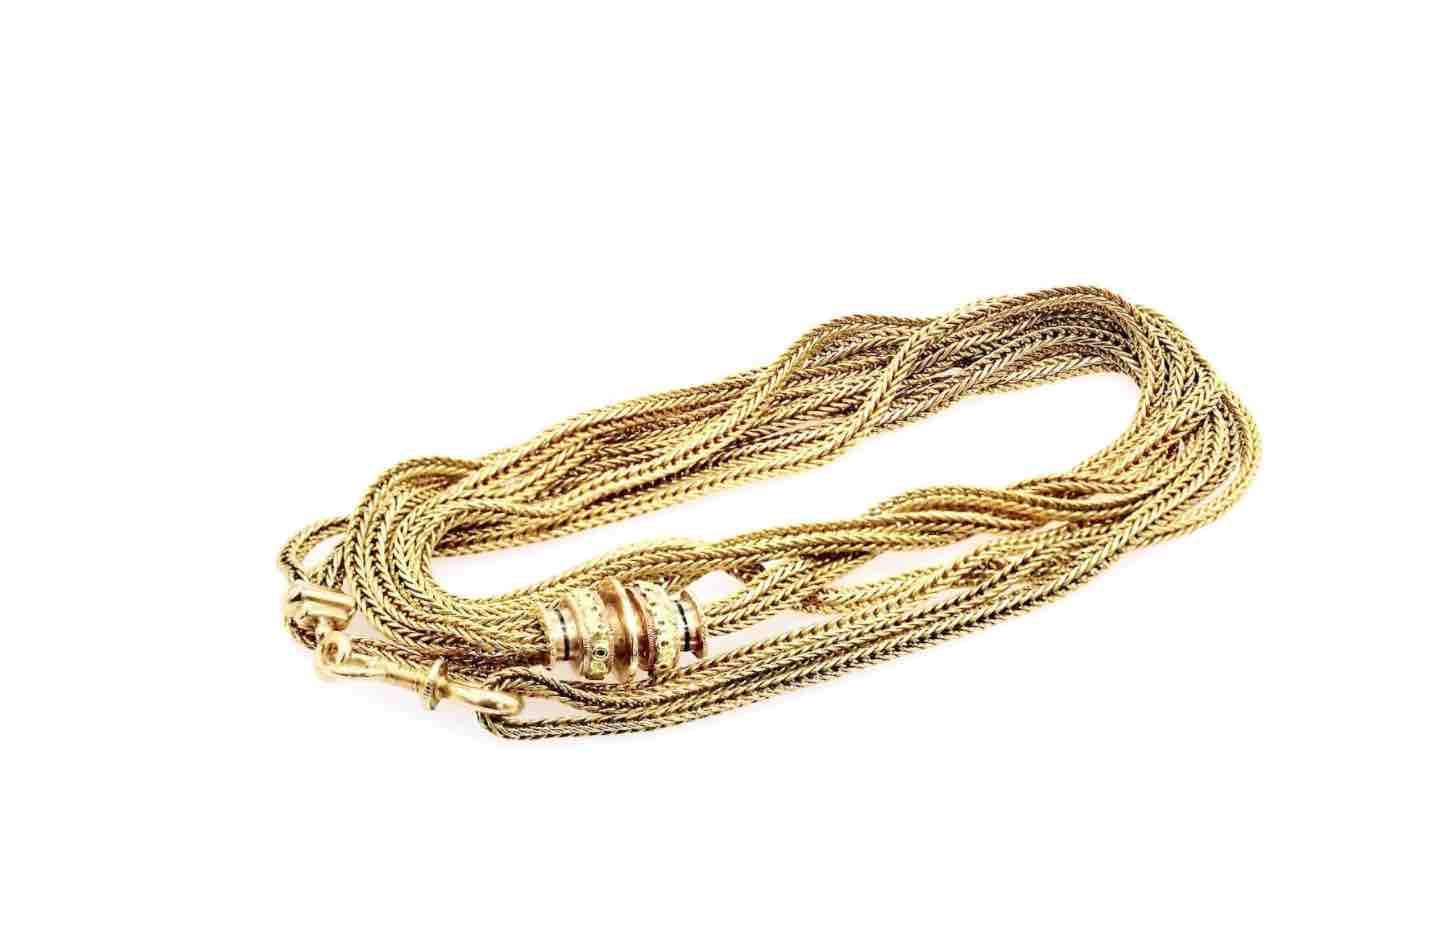 Chaine en or 19e à vendre